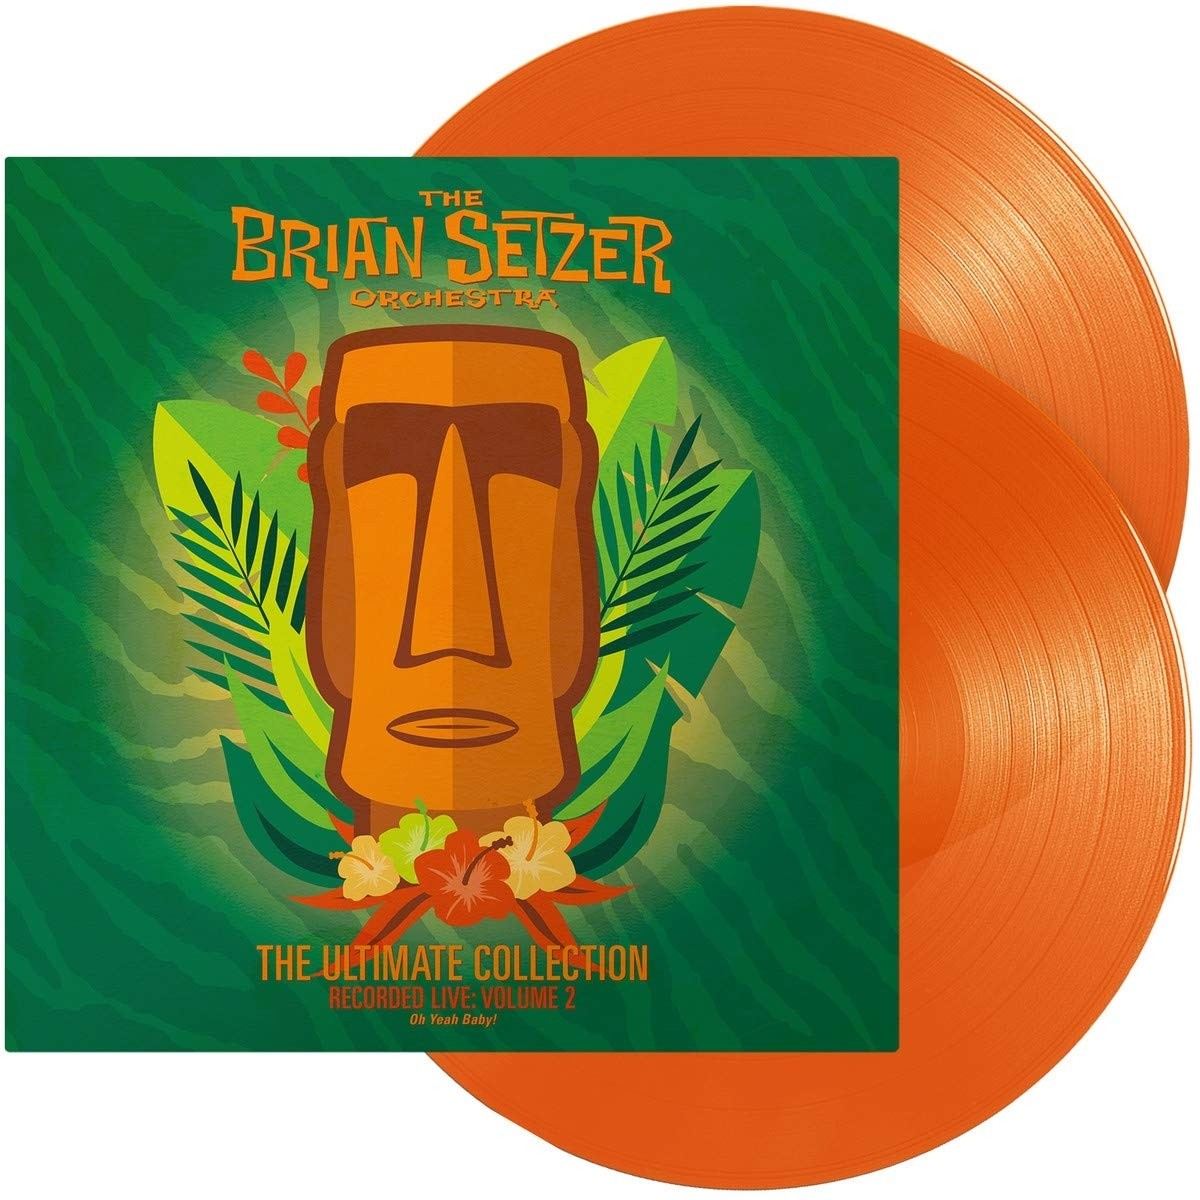 Buy Brian Setzer & The Brian Setzer Orchestra - The Ultimate Collection Recorded Live: Volume 2 (Orange) 2XLP at SRCVinyl. 2020 LIMITED ORANGE VINYL